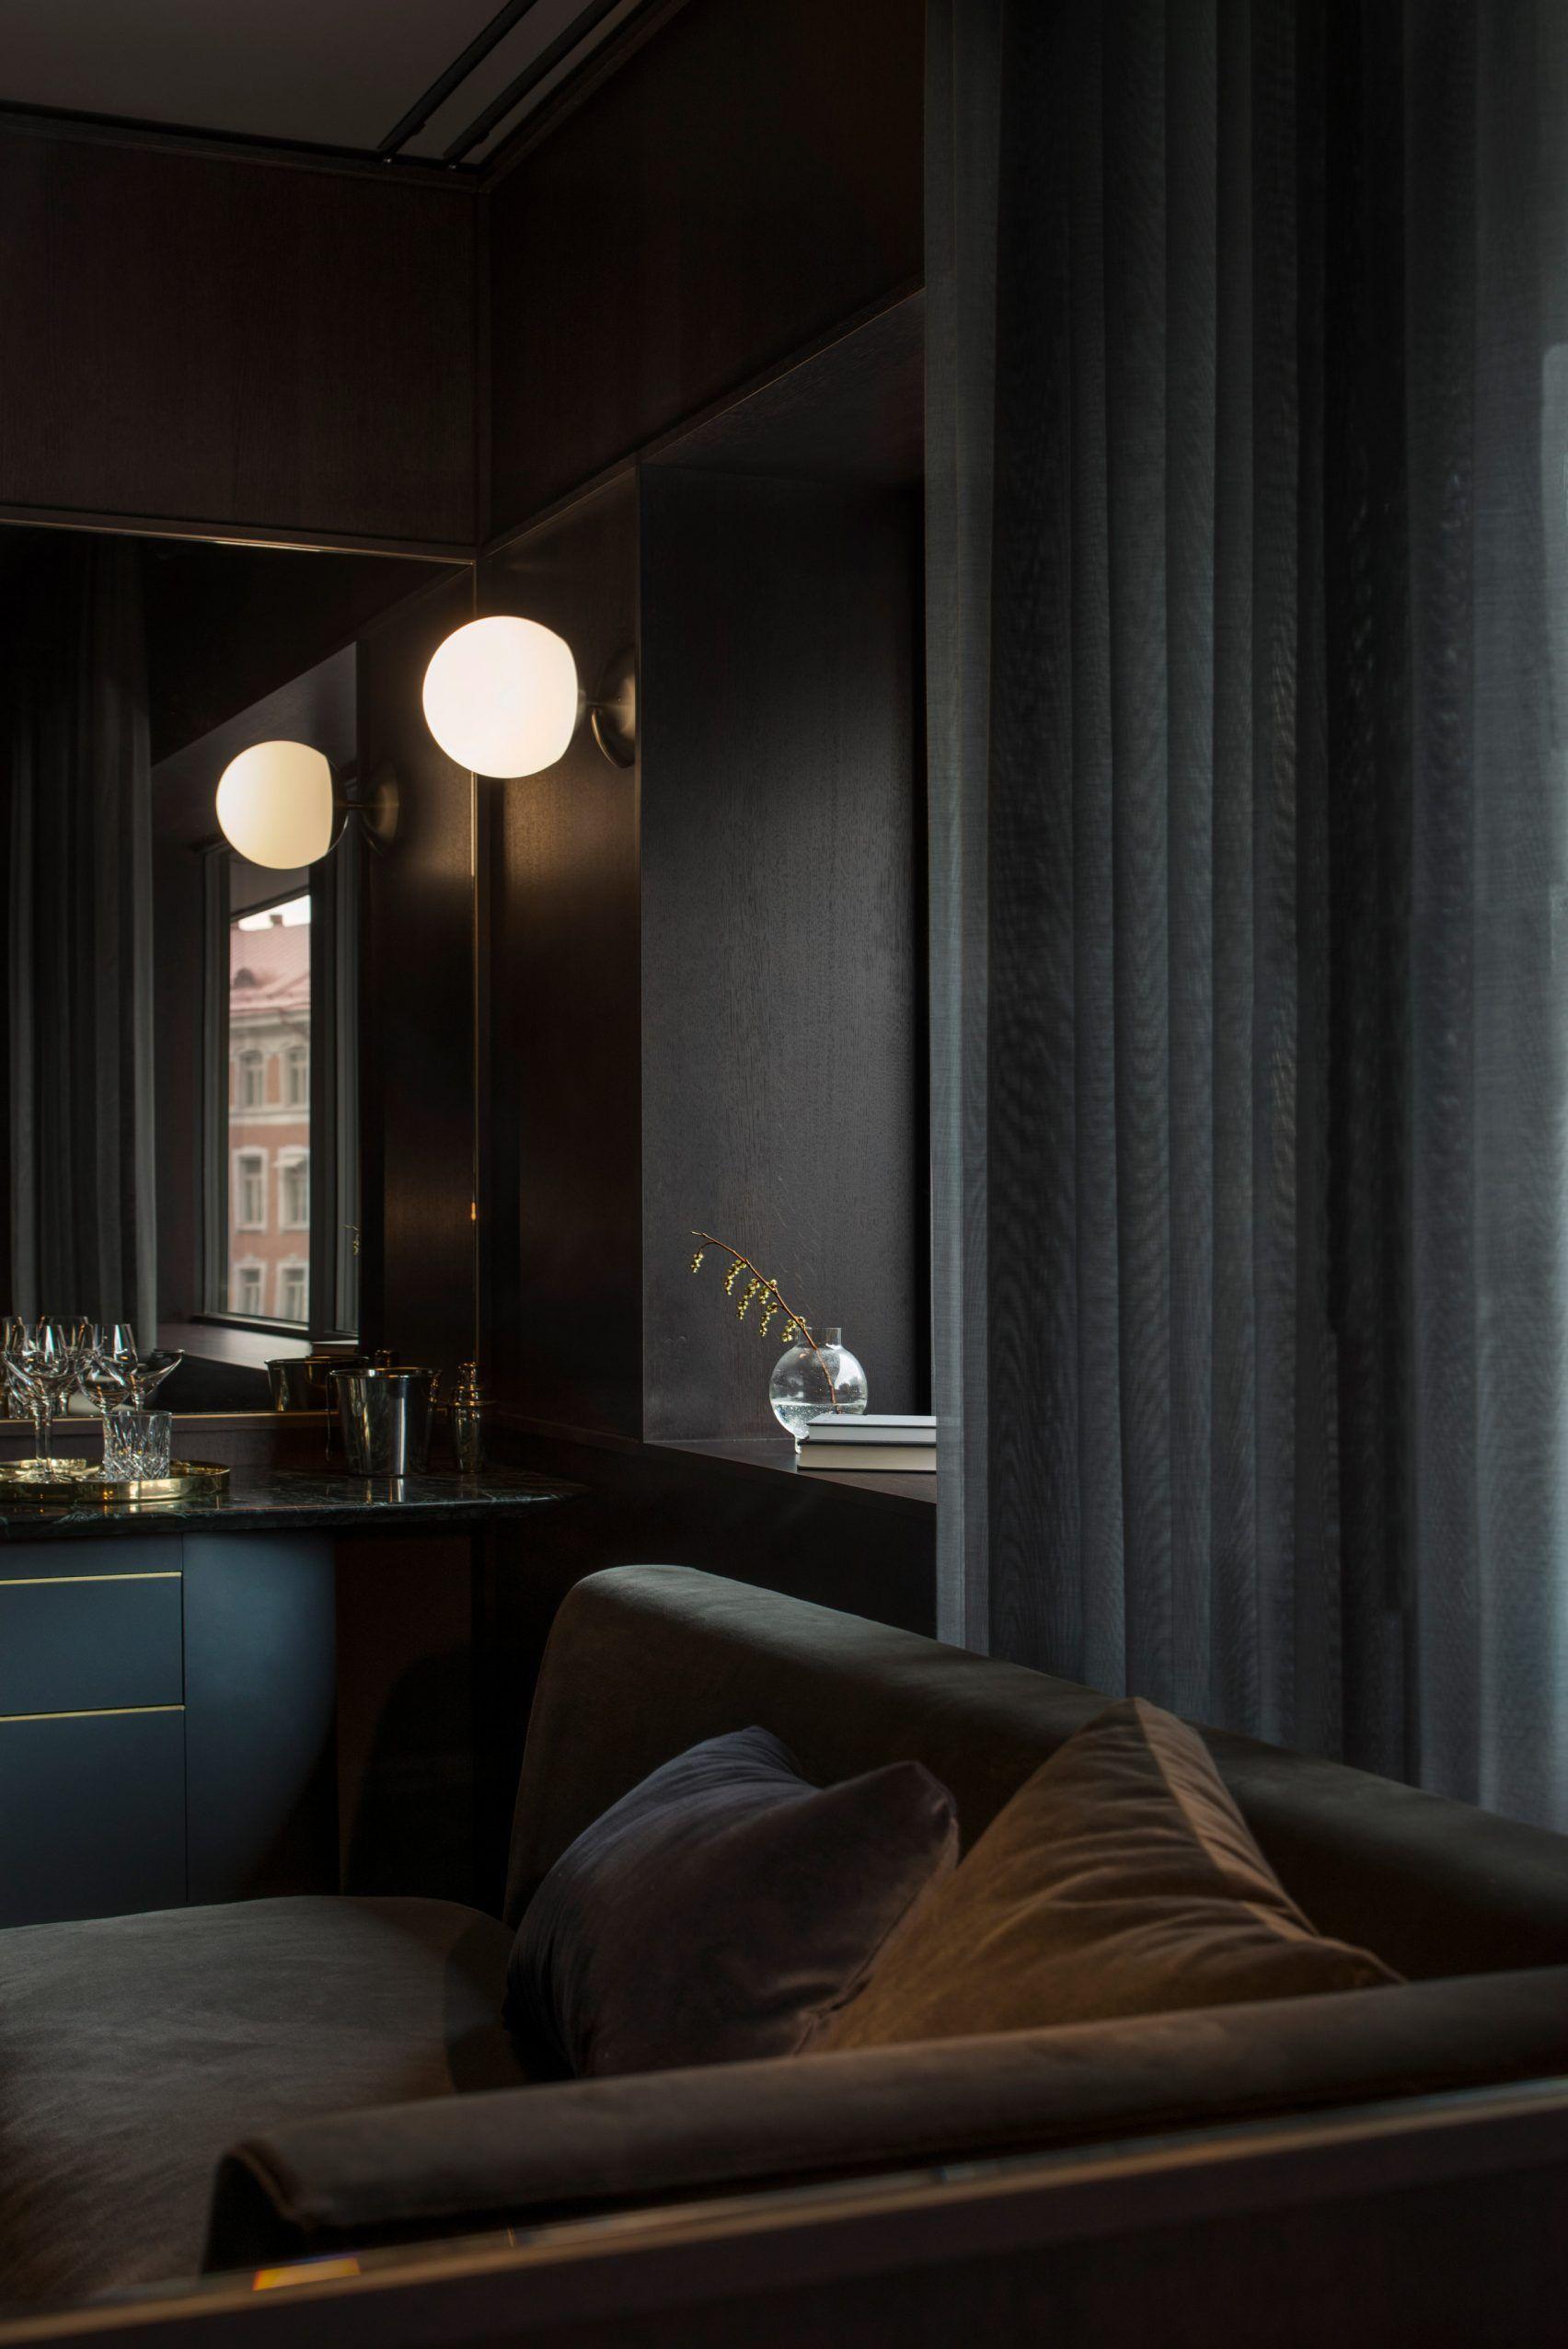 Home Decor Ideas for A Dark And Luxurious Interior ...